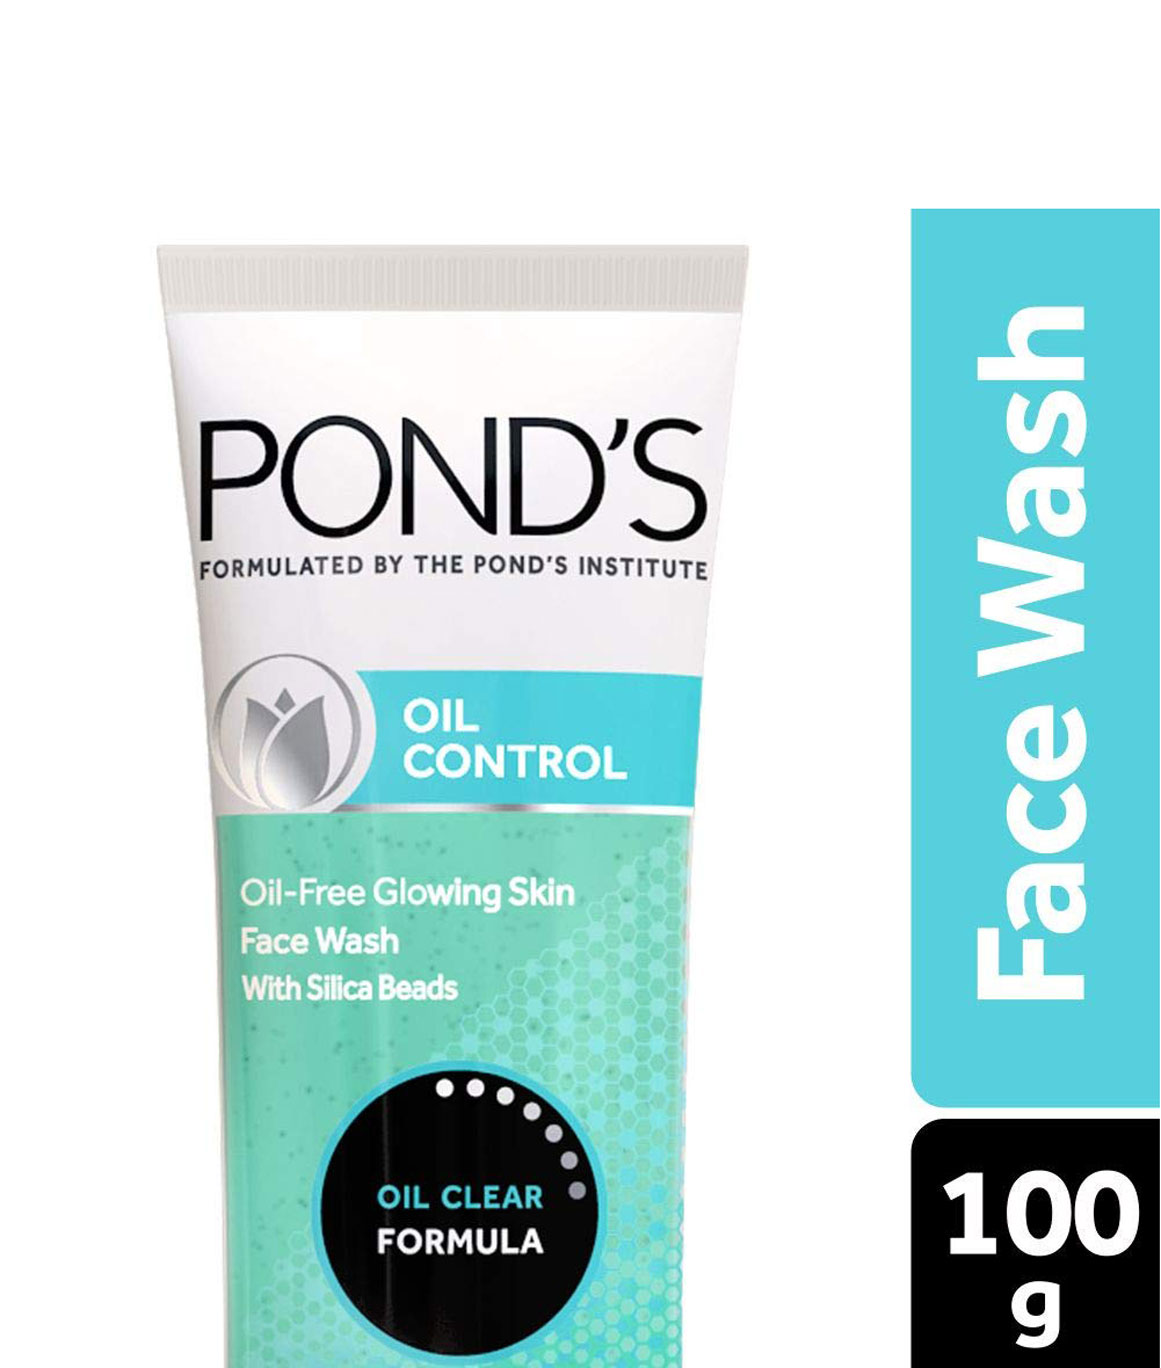 PONDS Oil Control Face Wash, 100 gm